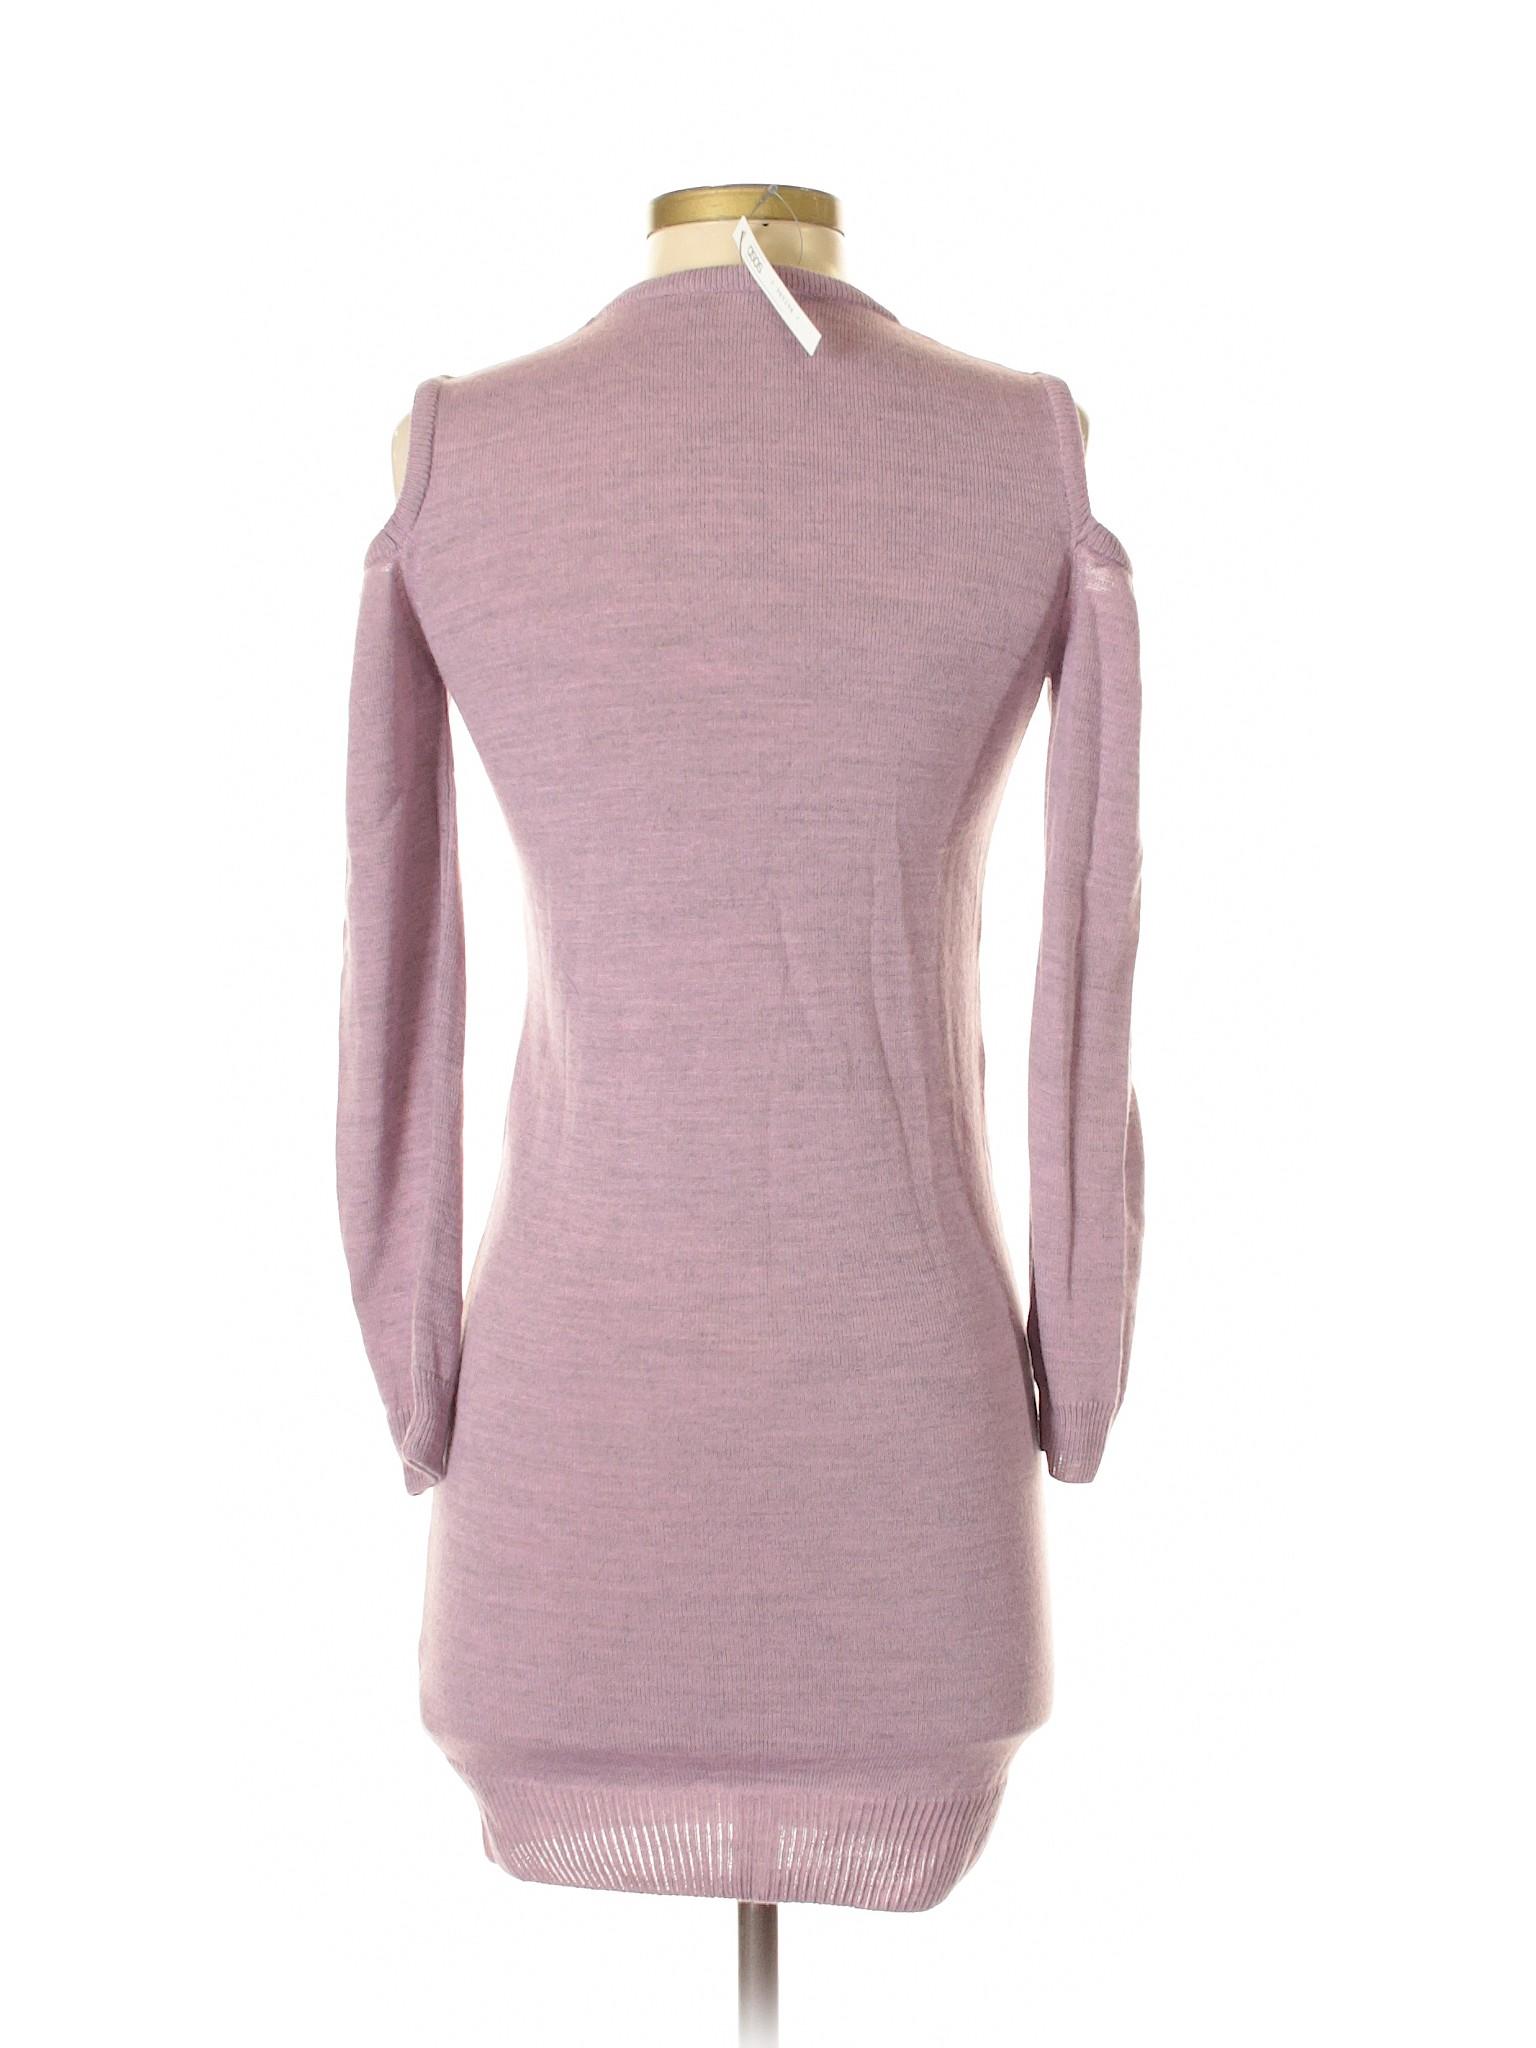 Dress winter Curve Boutique Casual ASOS qO4WWcF